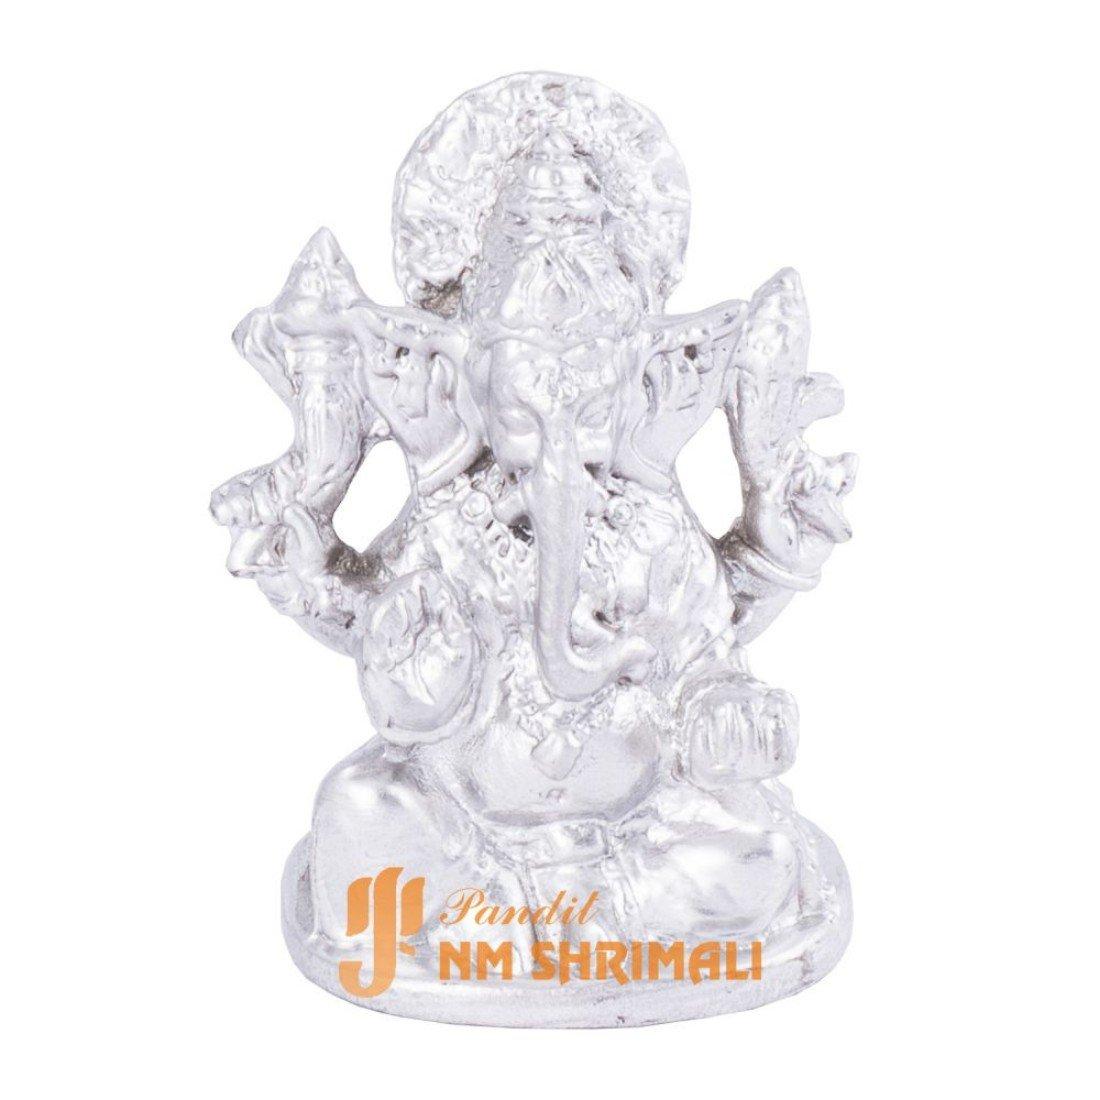 Mercury Pandit NM Shrimali Parad Ganesh 115Gm